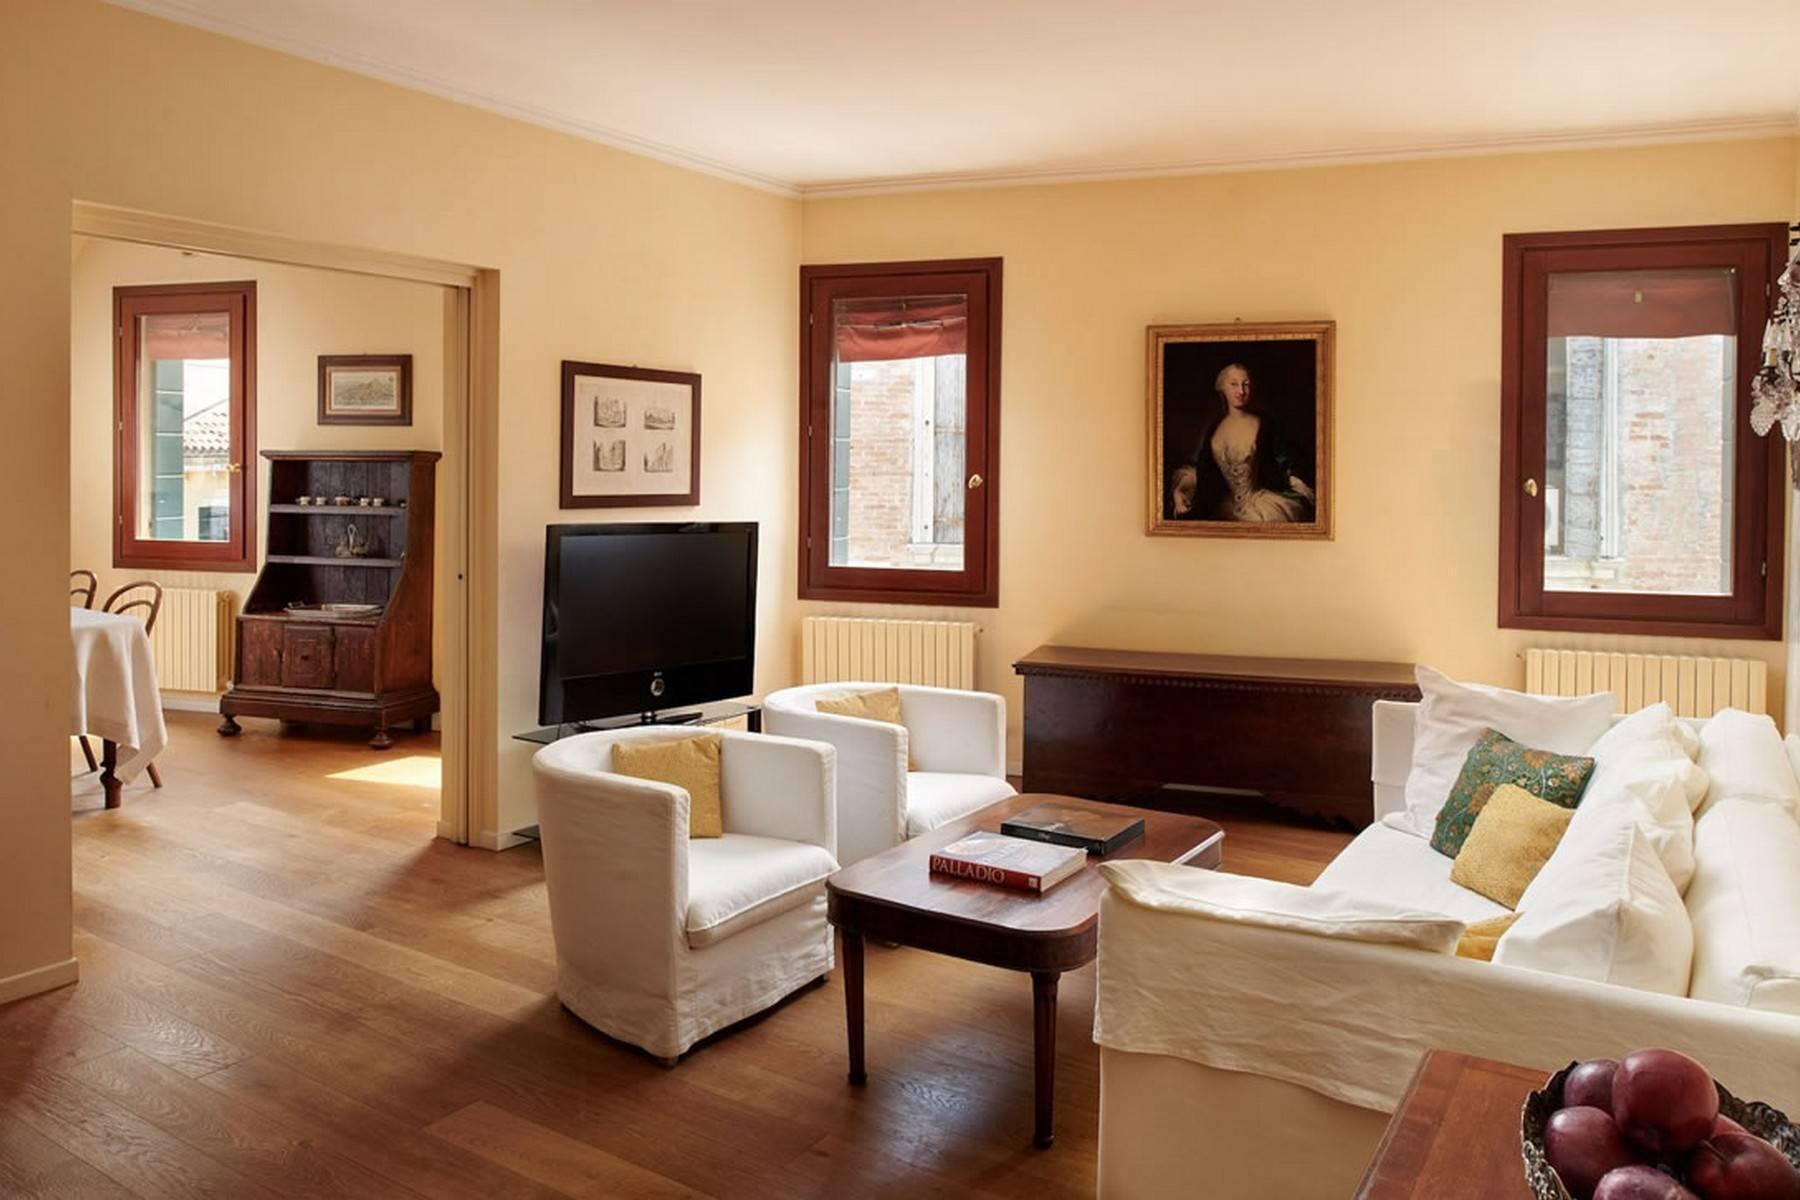 Appartement de design dans le Palazzo Querini Stampalia / S.M. Formosa - 2